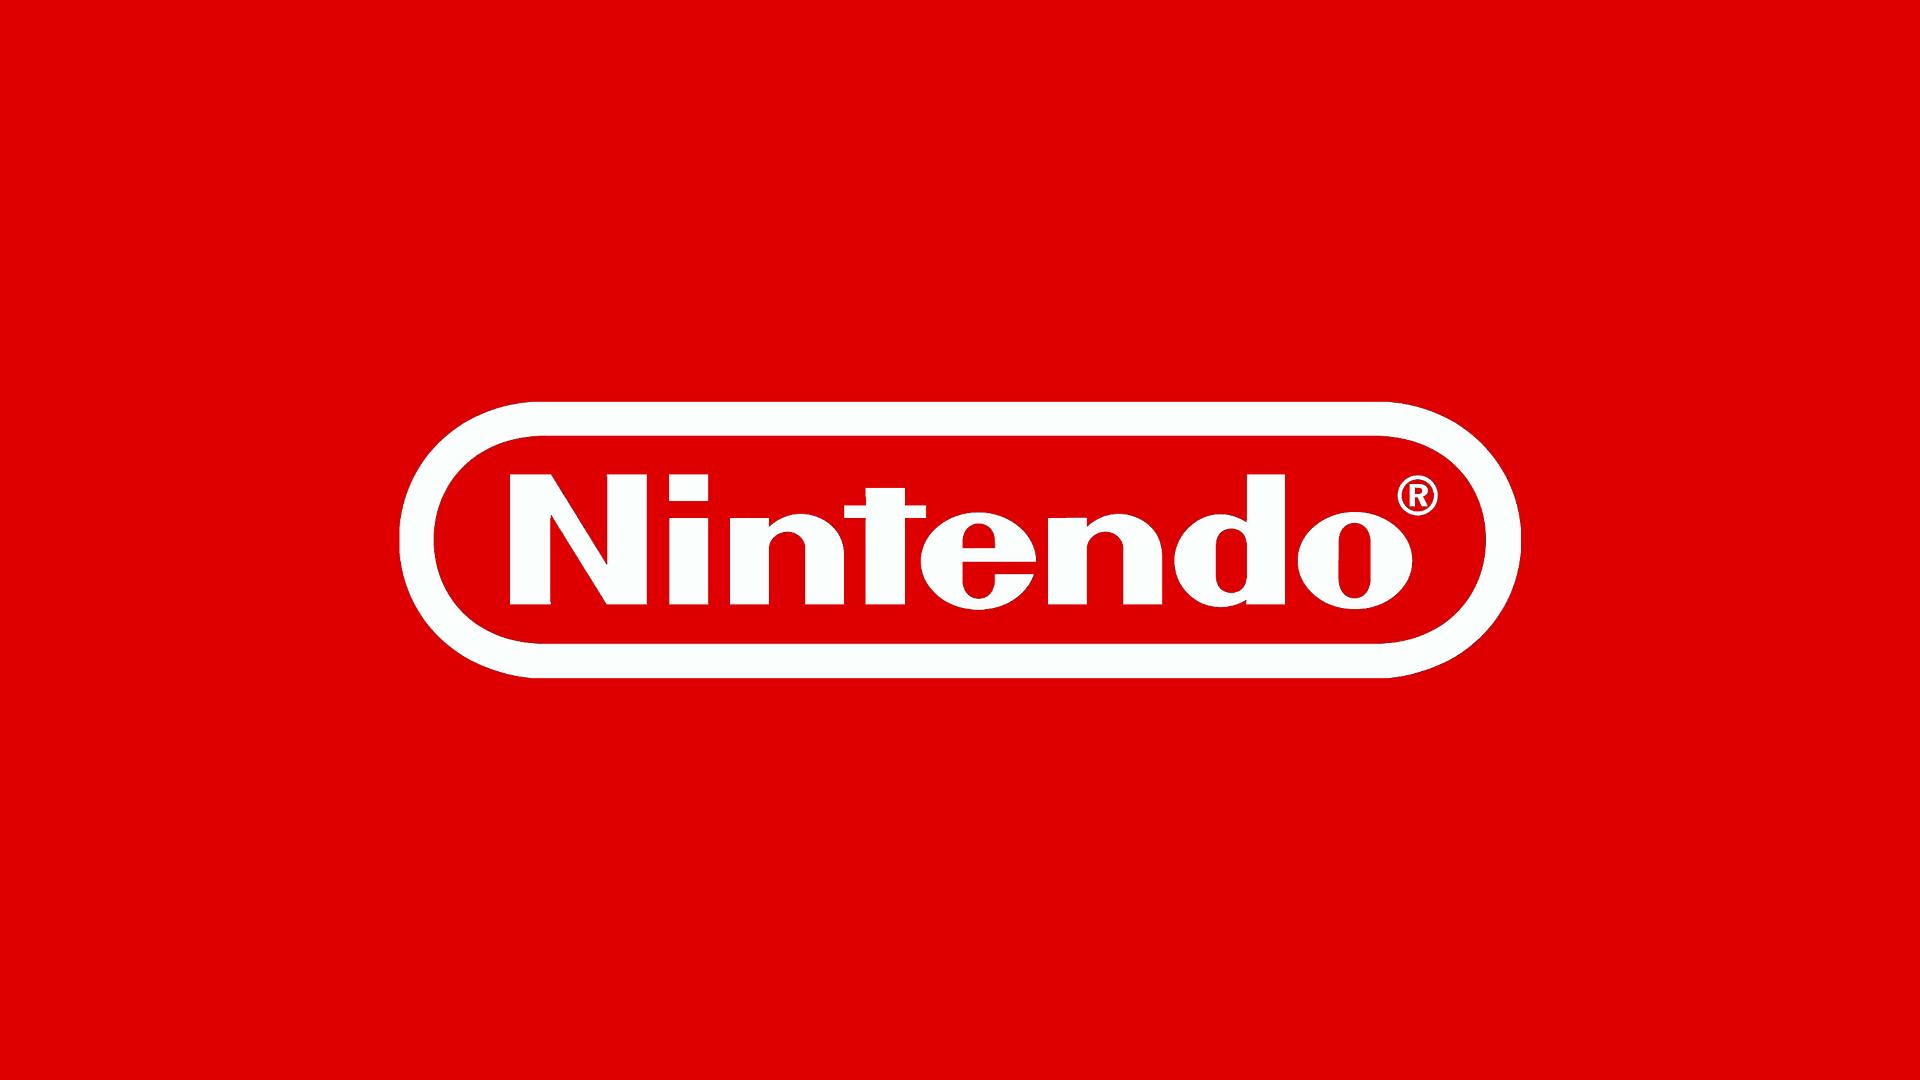 nintendo-se-actualiza-la-infografia-lanzamientos-switch-3ds-frikigamers.com